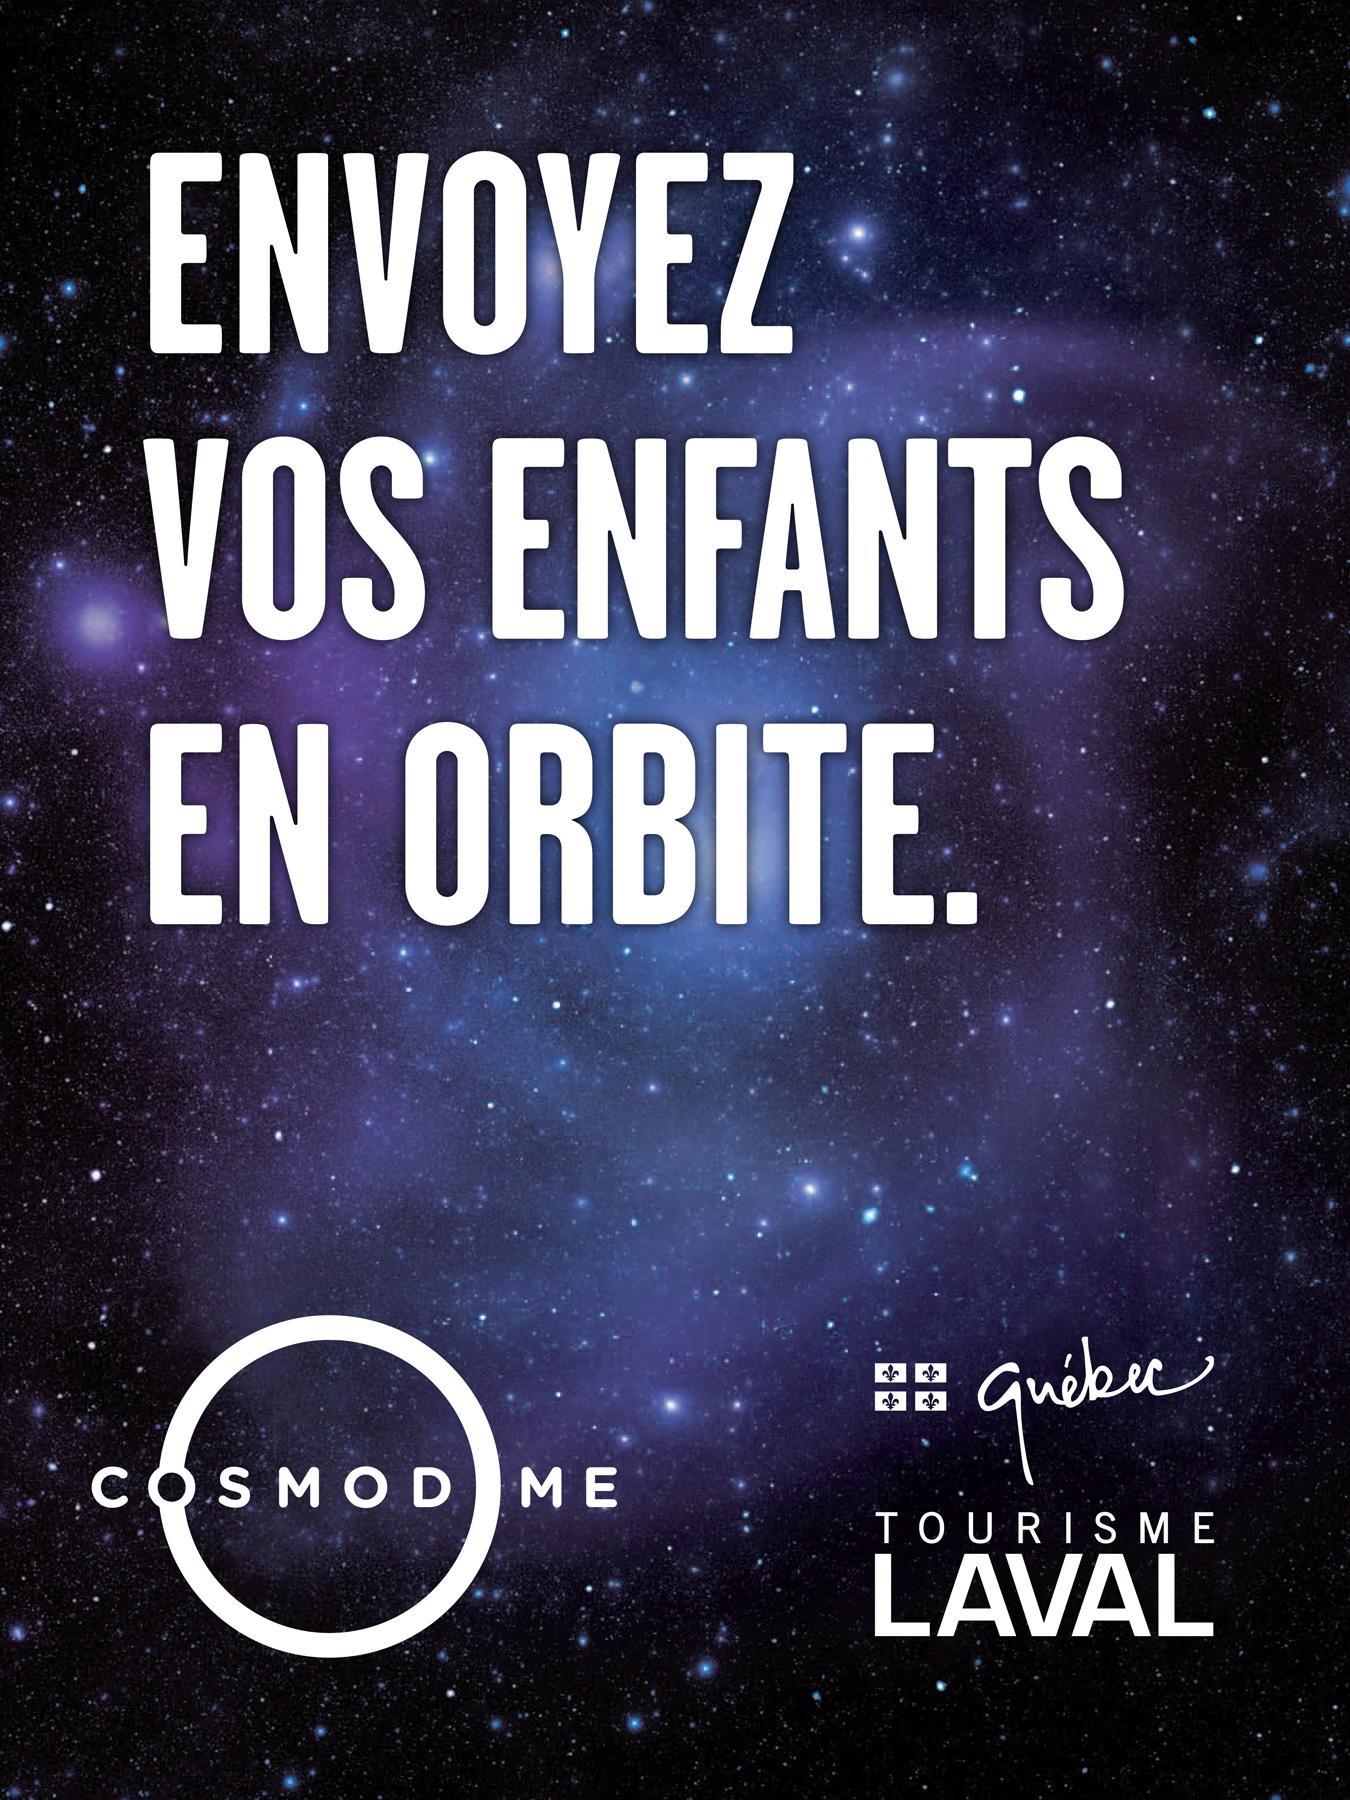 Cosmodome Print Ad -  Orbit